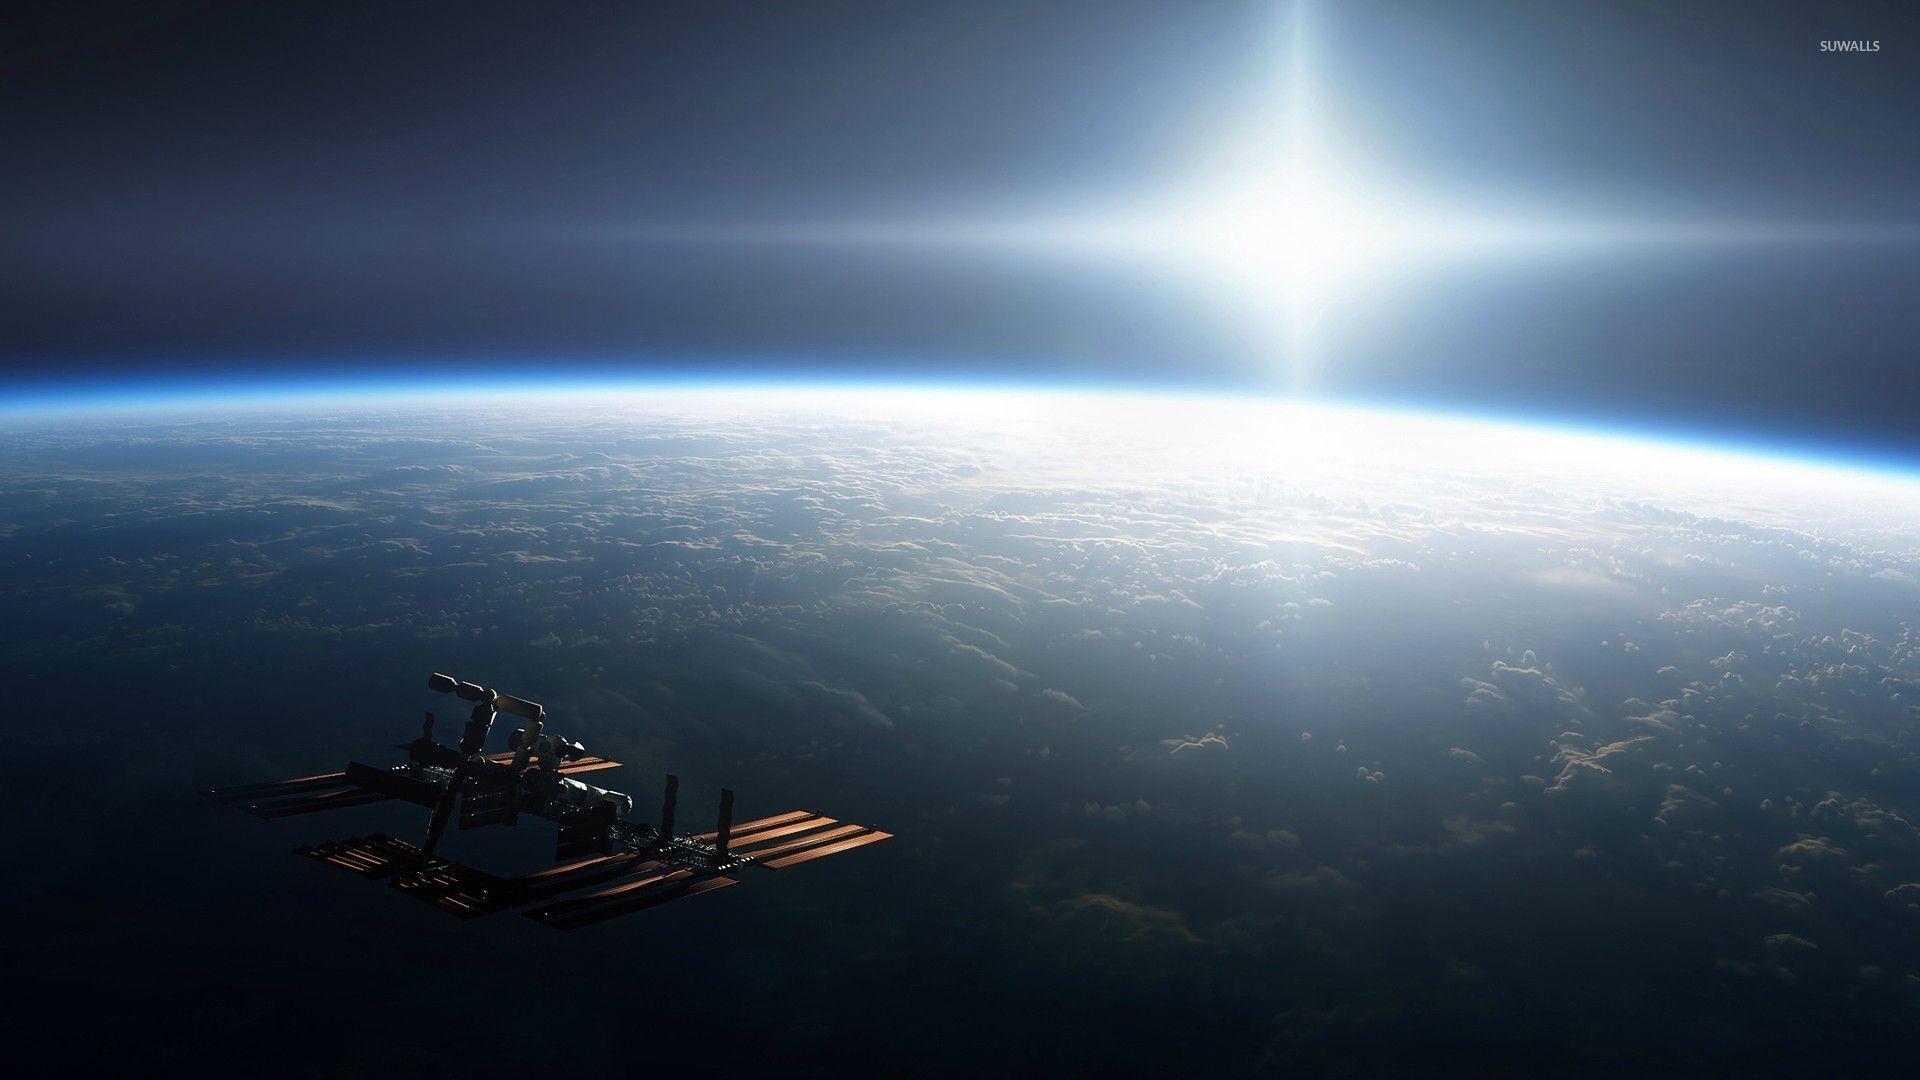 International Space Station orbiting Earth wallpaper